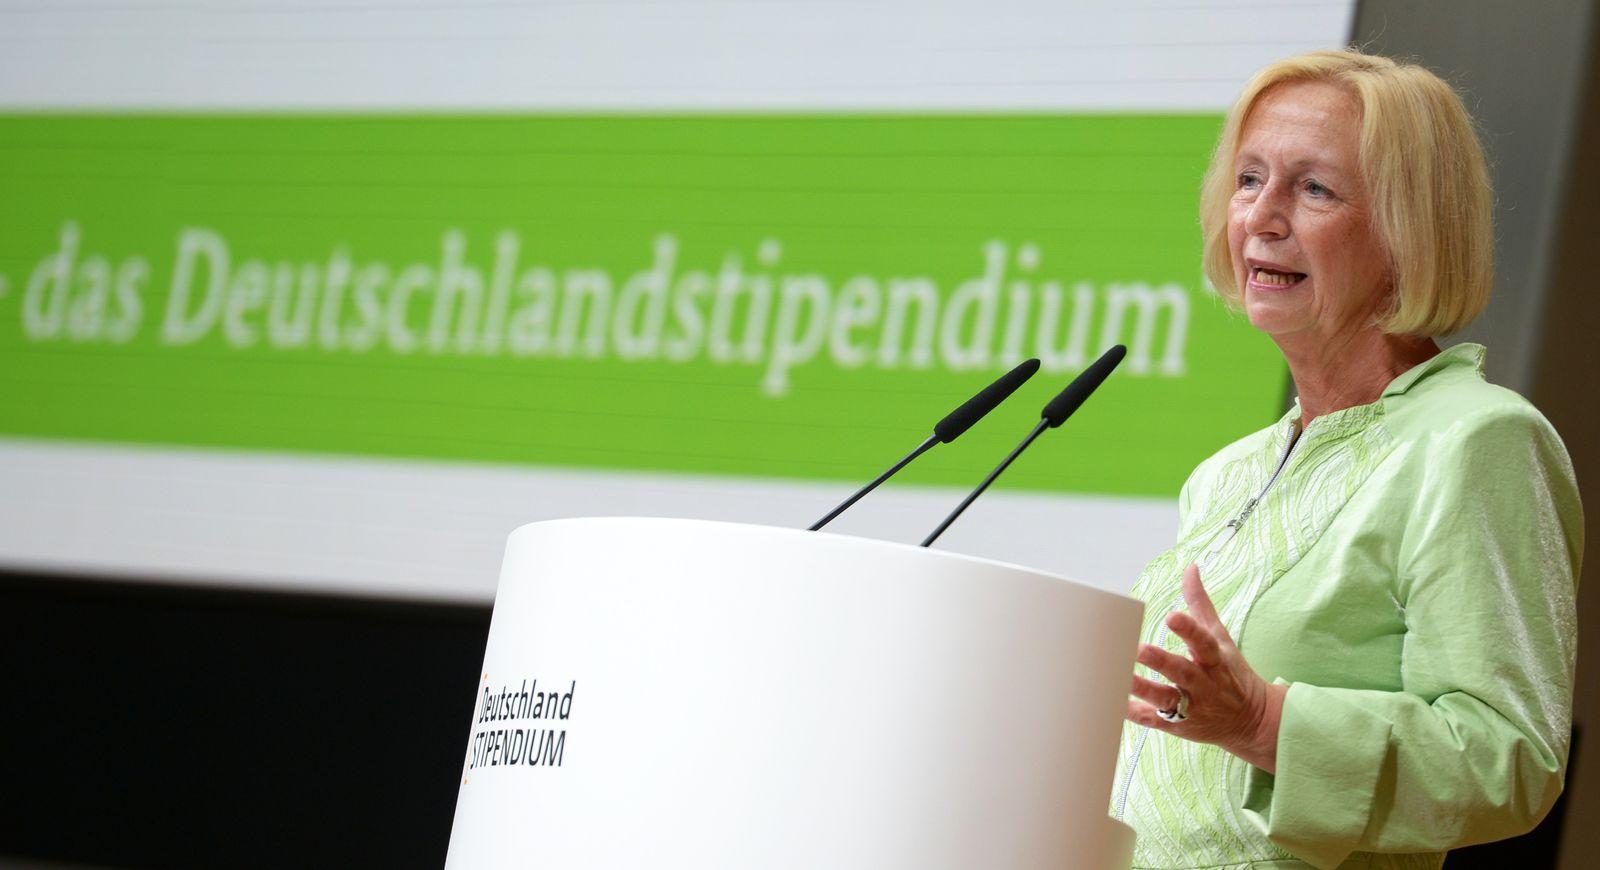 Deutschlandstipendium / Johanna Wanka